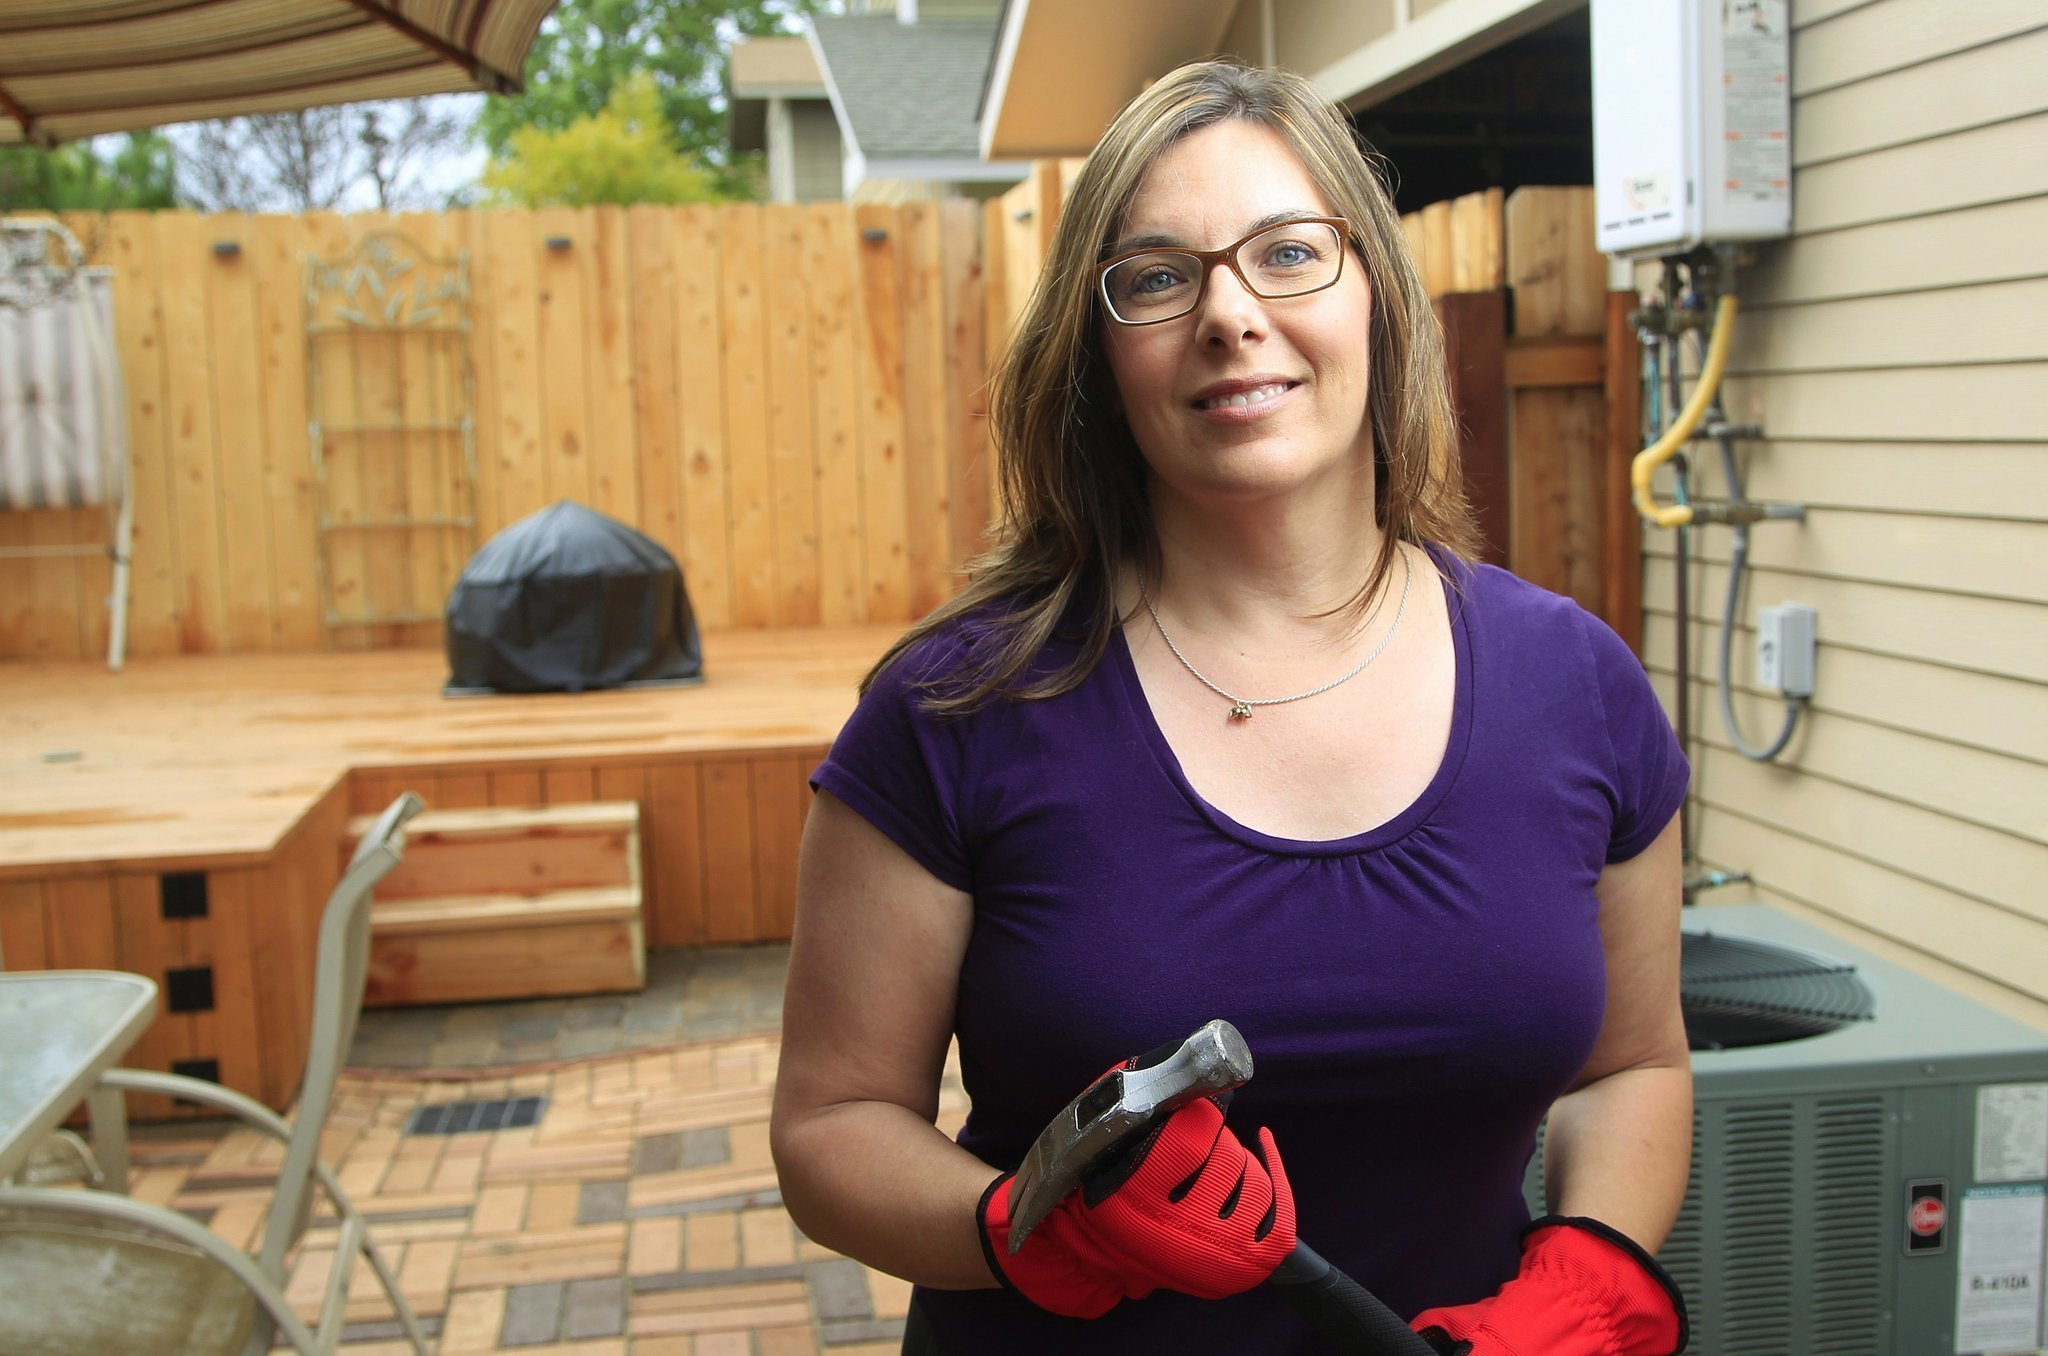 Empowerment tools for women - The San Diego Union-Tribune